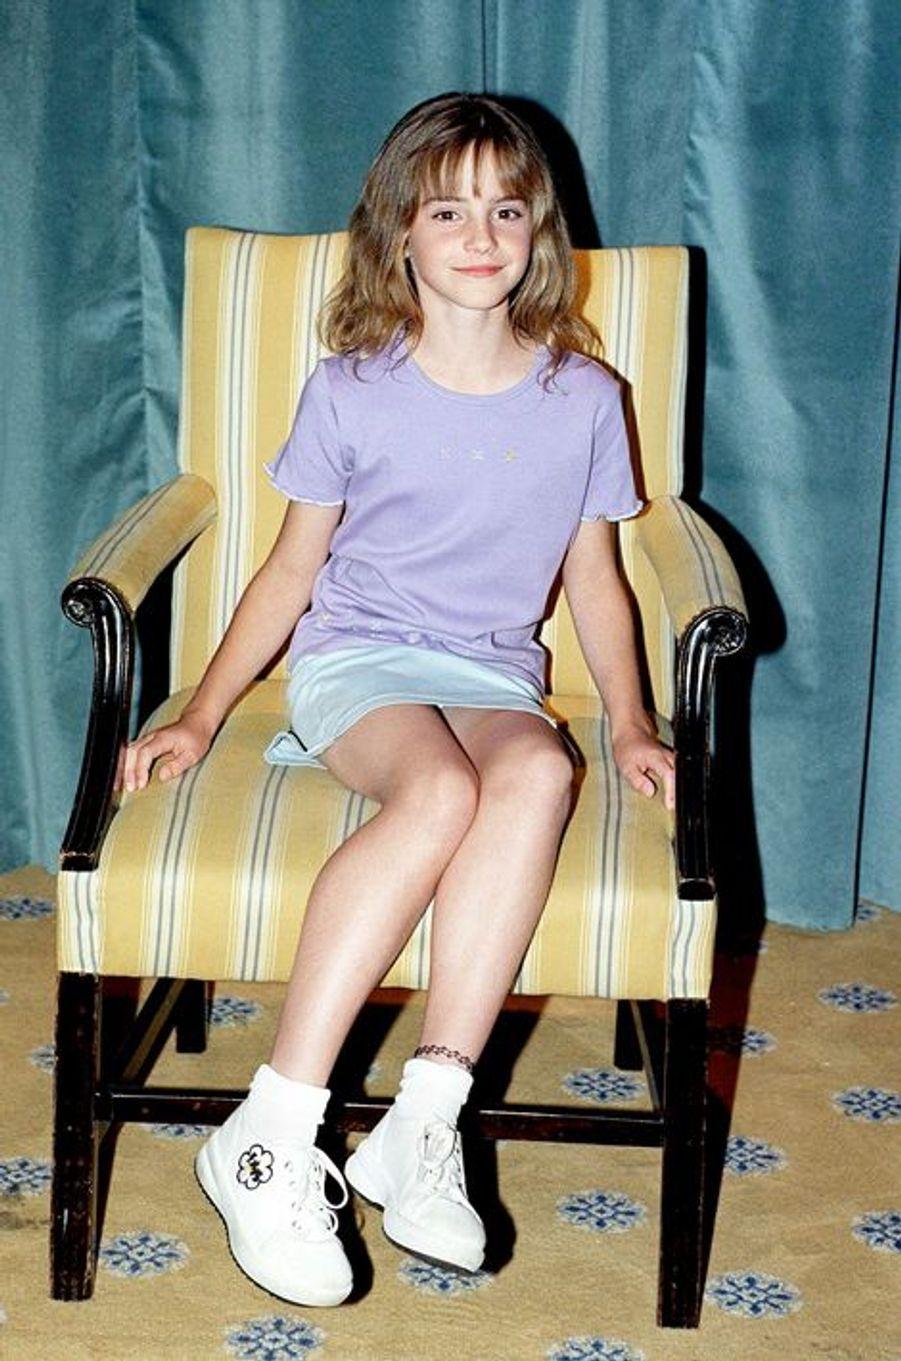 En août 2000